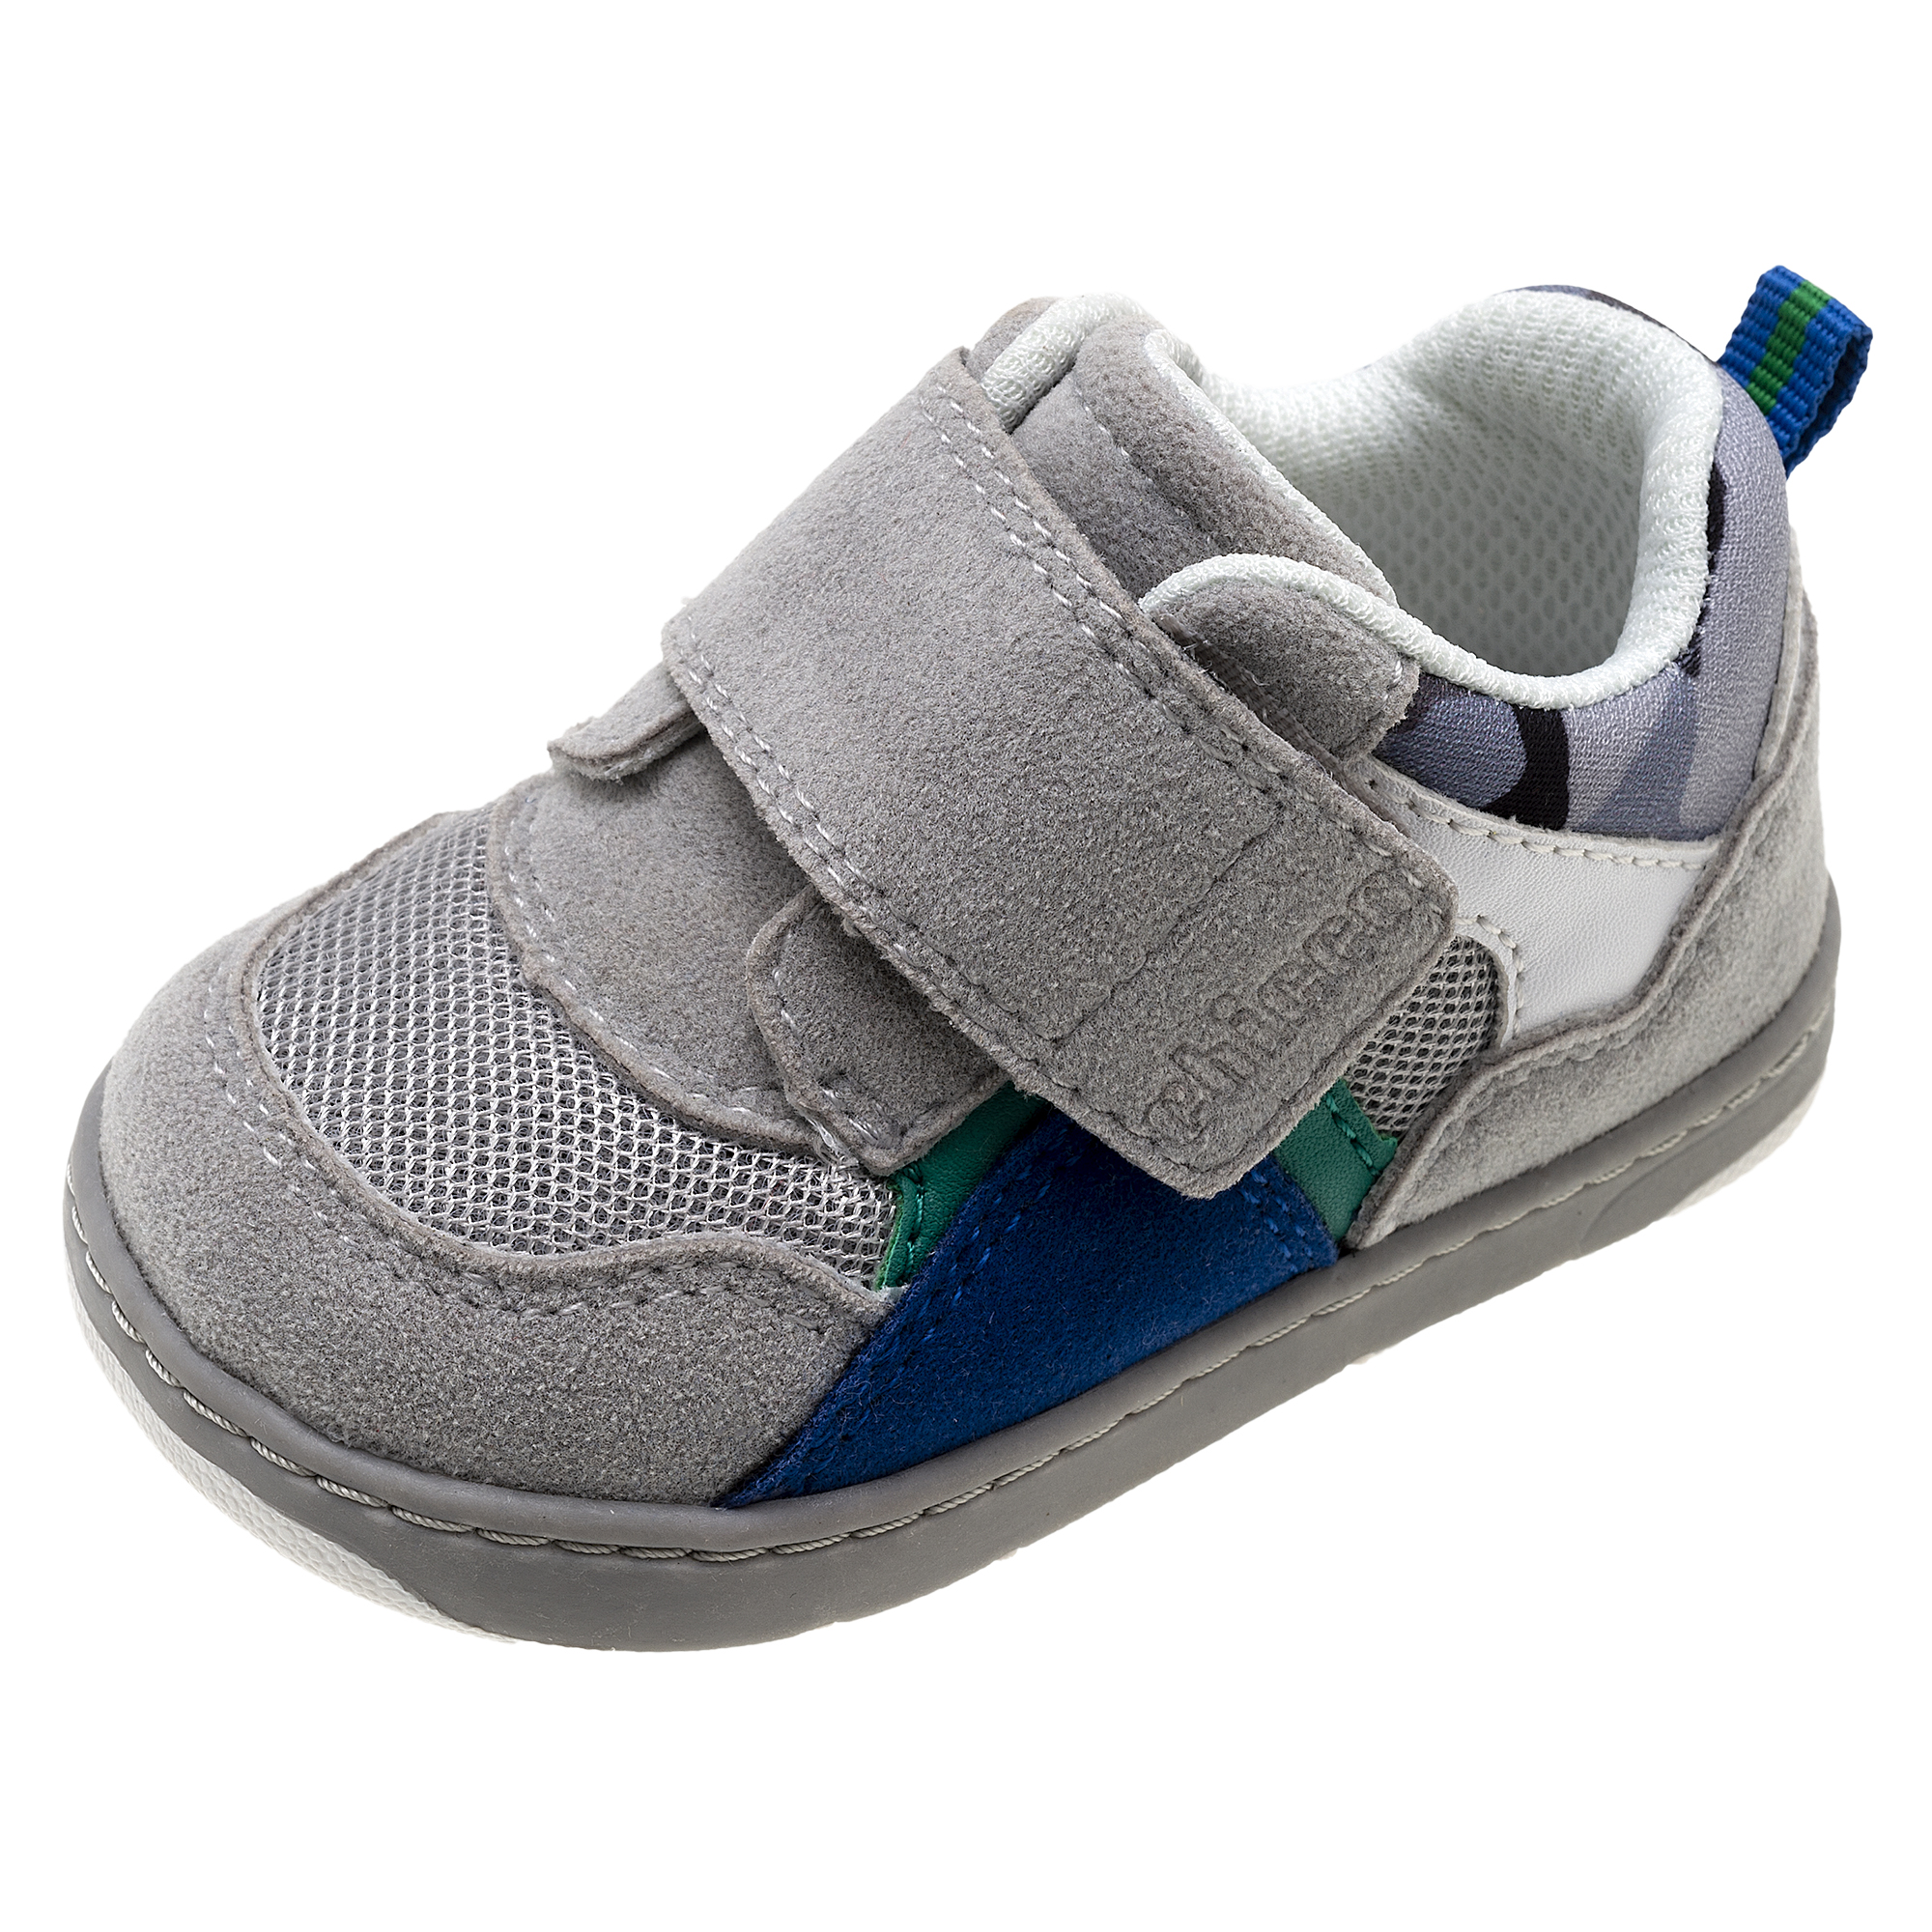 Pantof Sport Copii Chicco Guanito, Gri Inchis, 61504 imagine